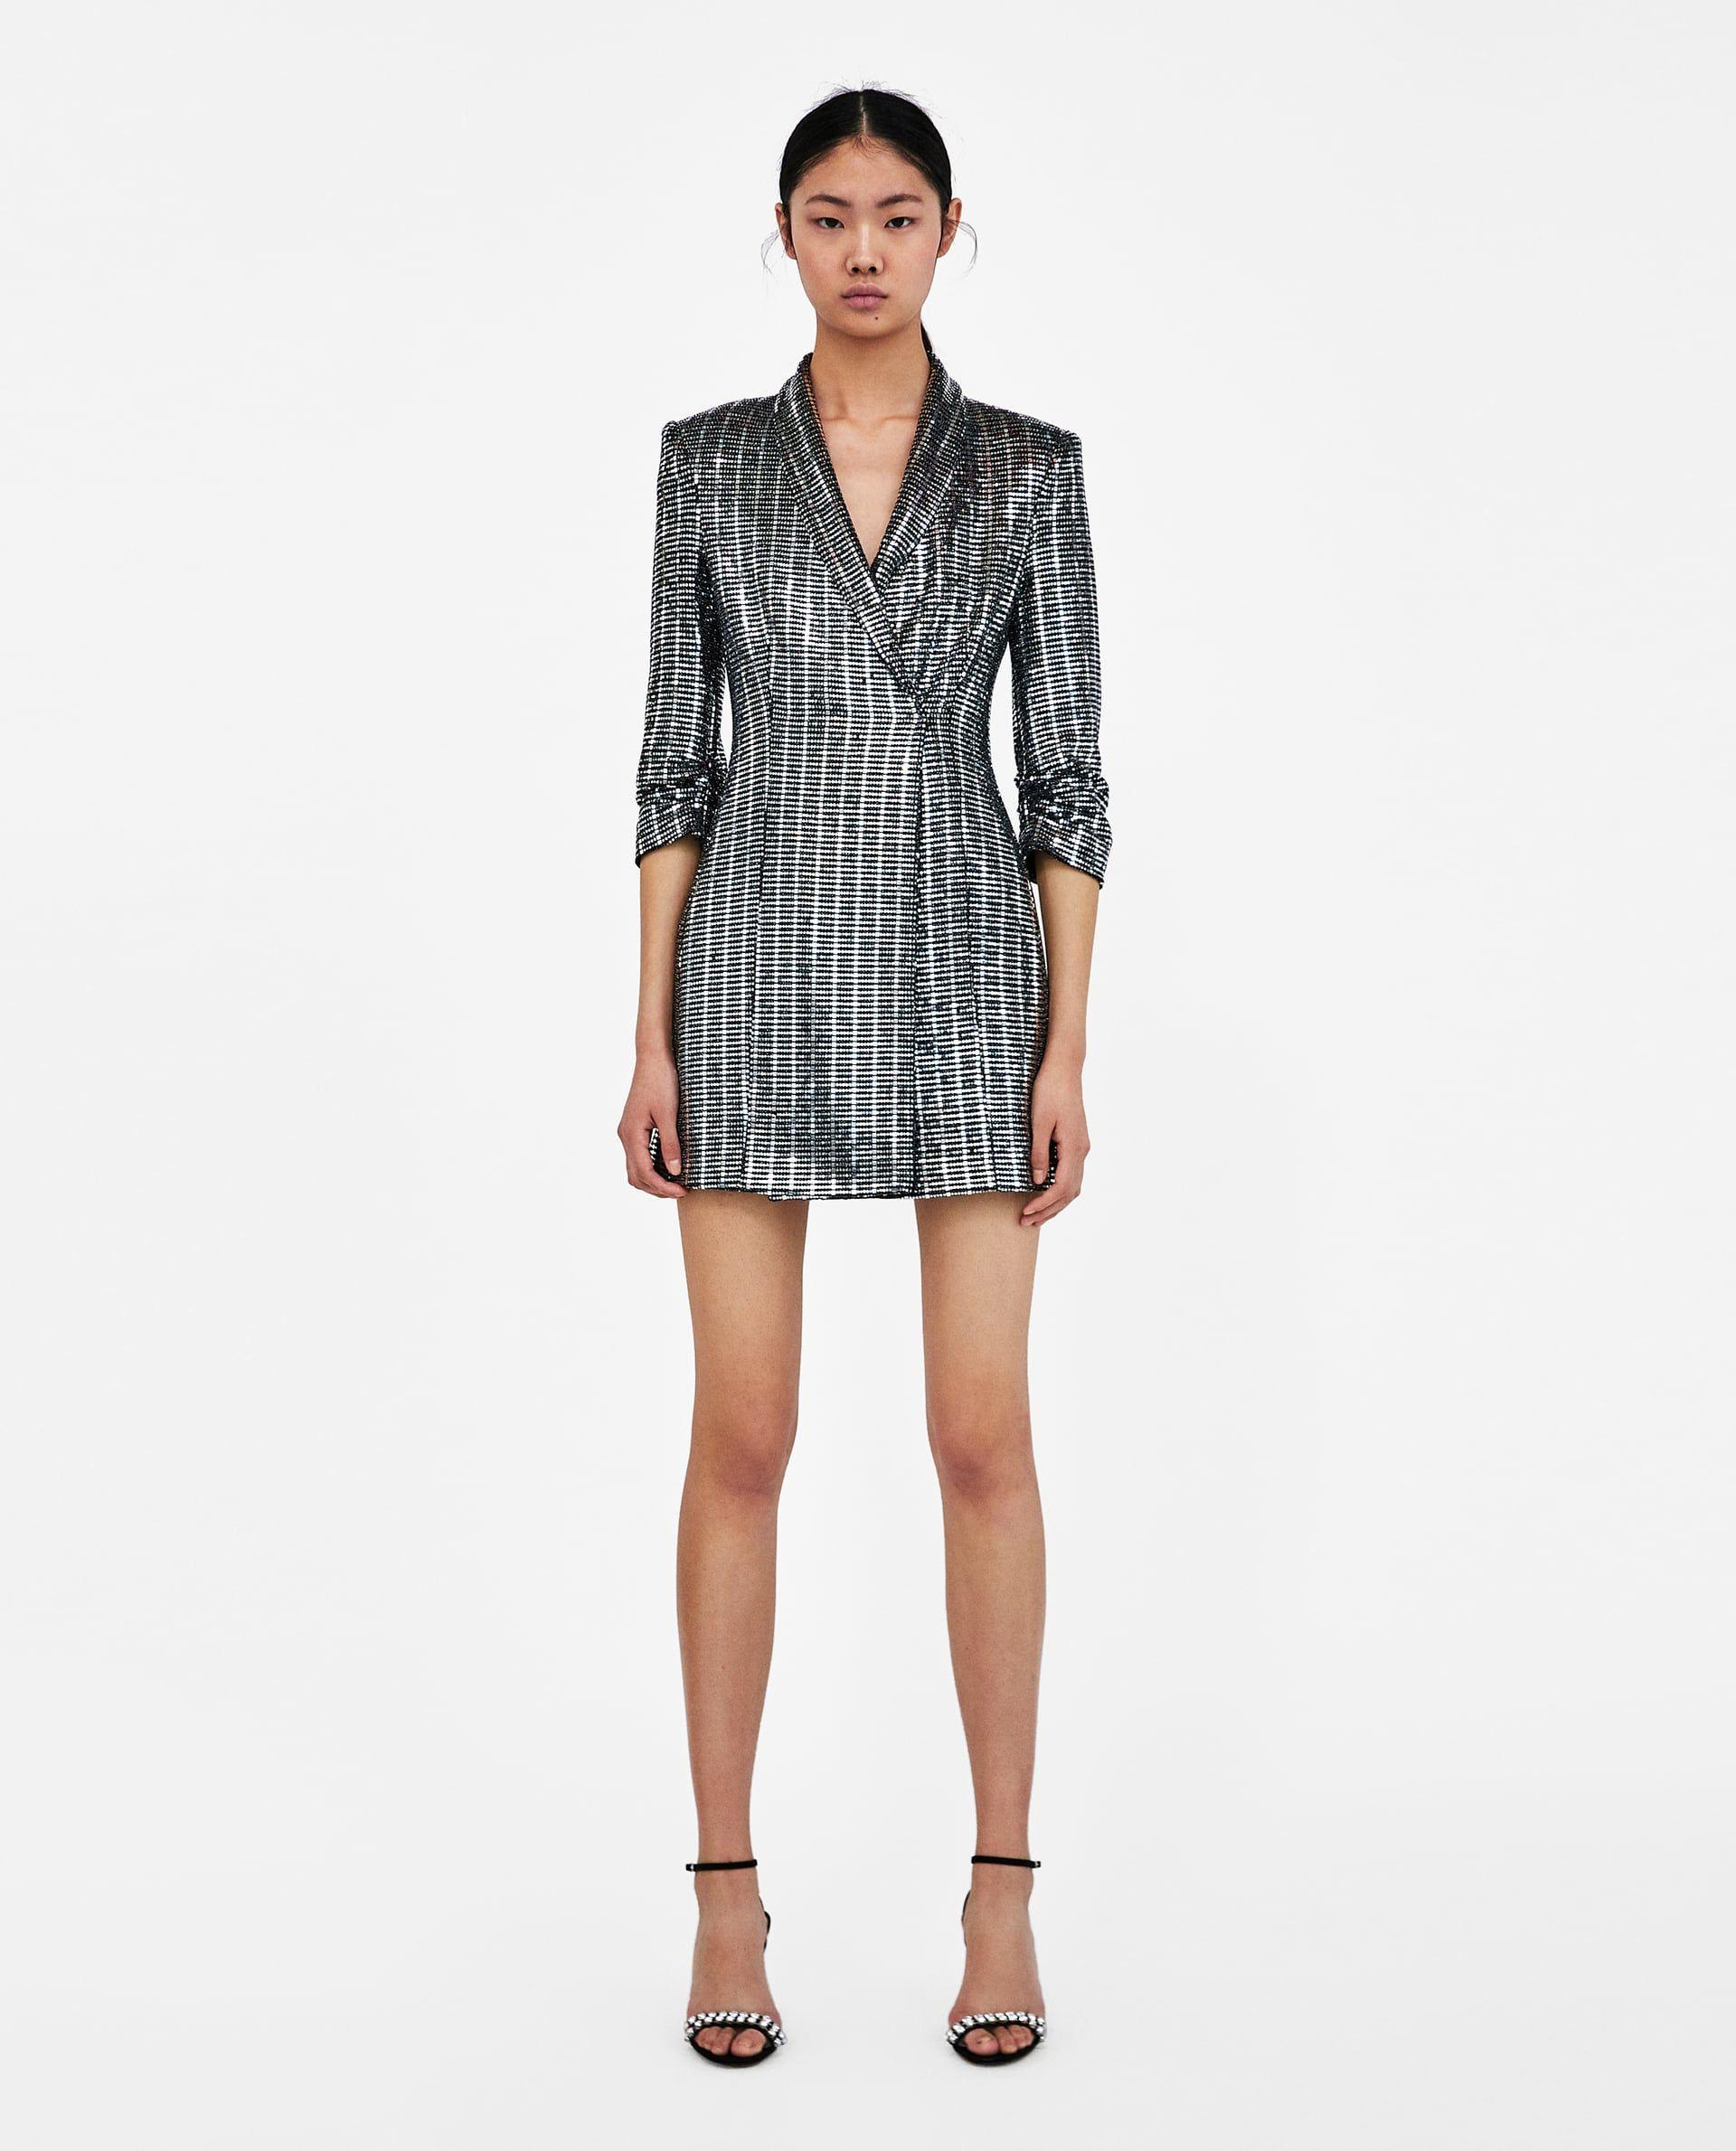 Metalizado Vestido Blazer Vestido Zara Blazer pqwxZCpd